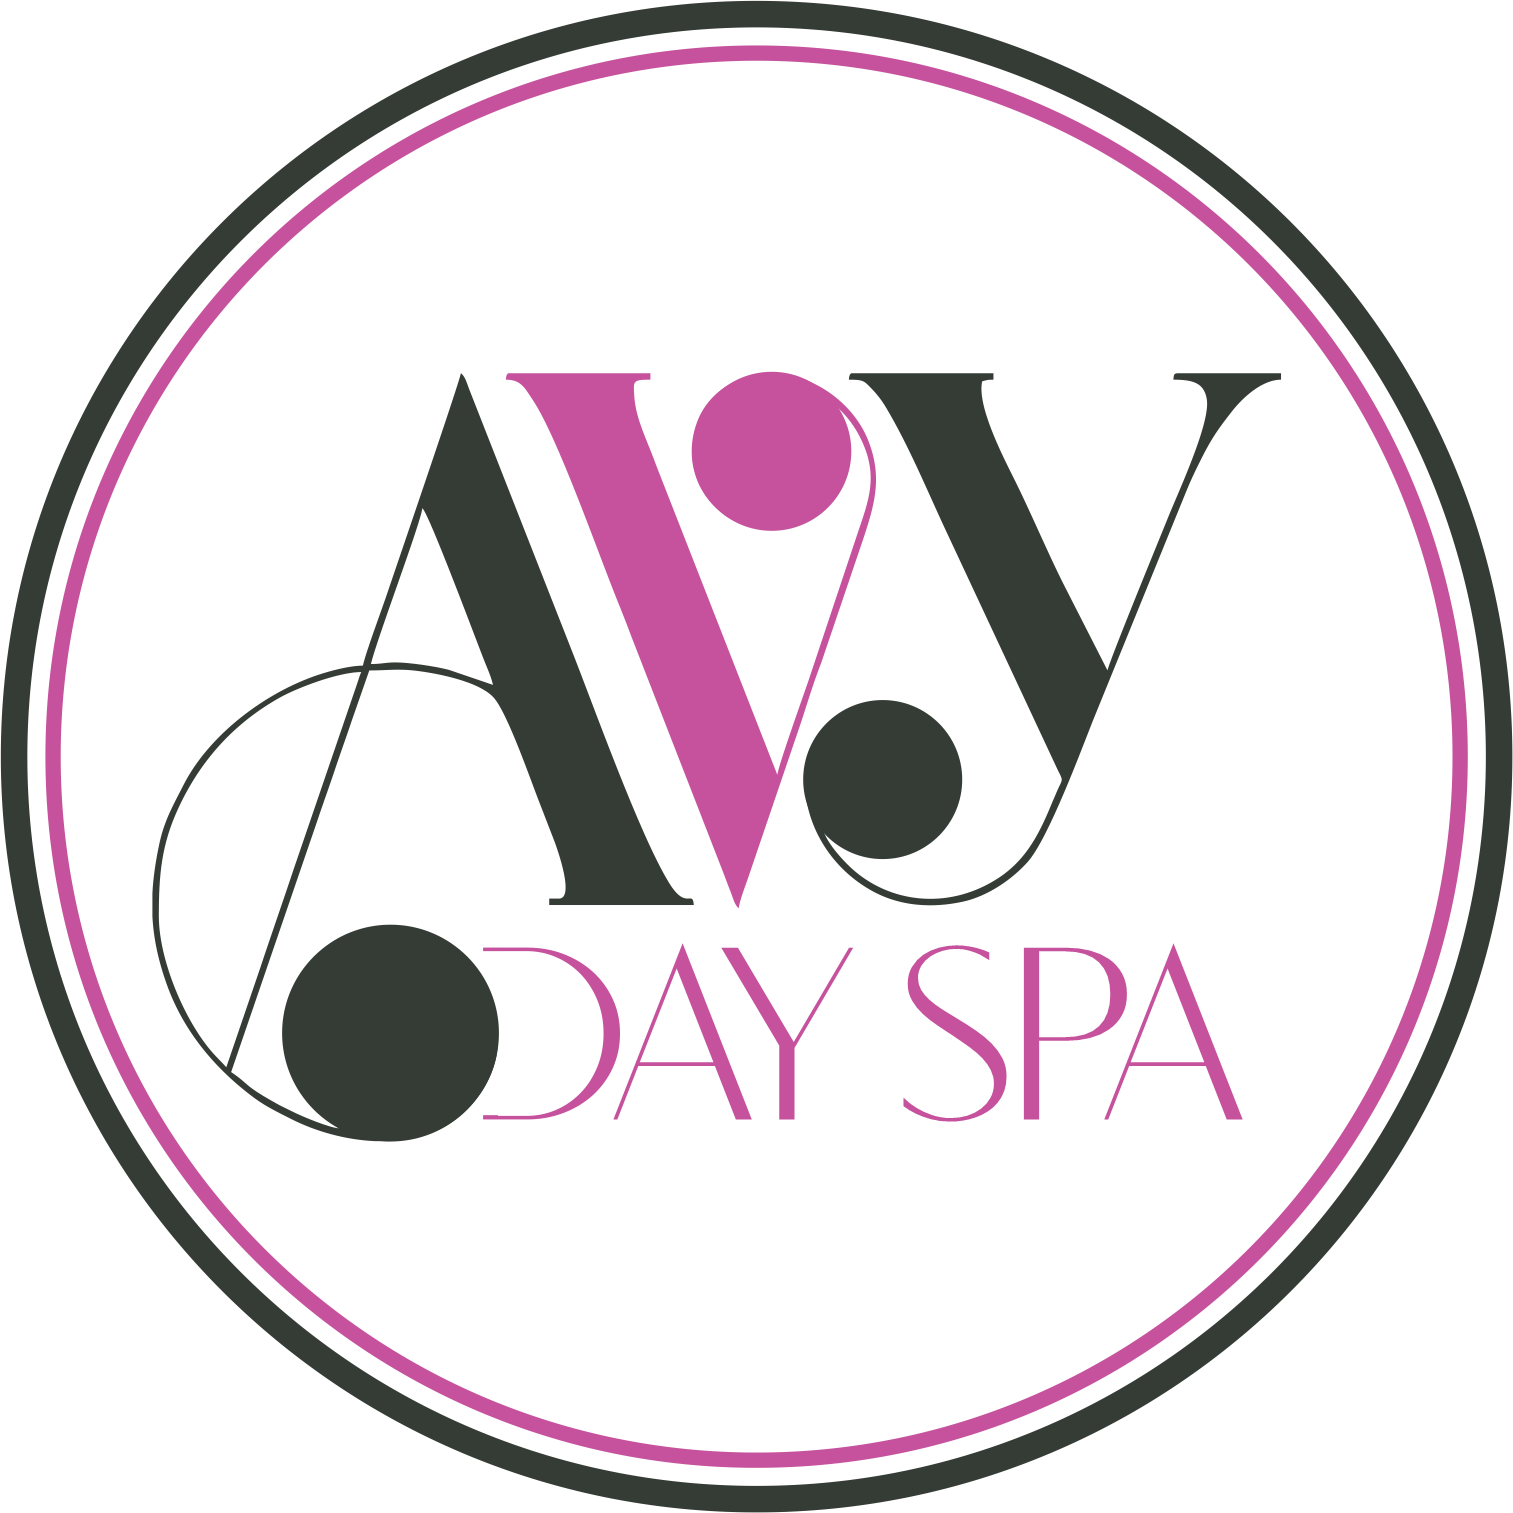 Avys Day Spa | Nail salon 75201 | Uptown | Dallas TX